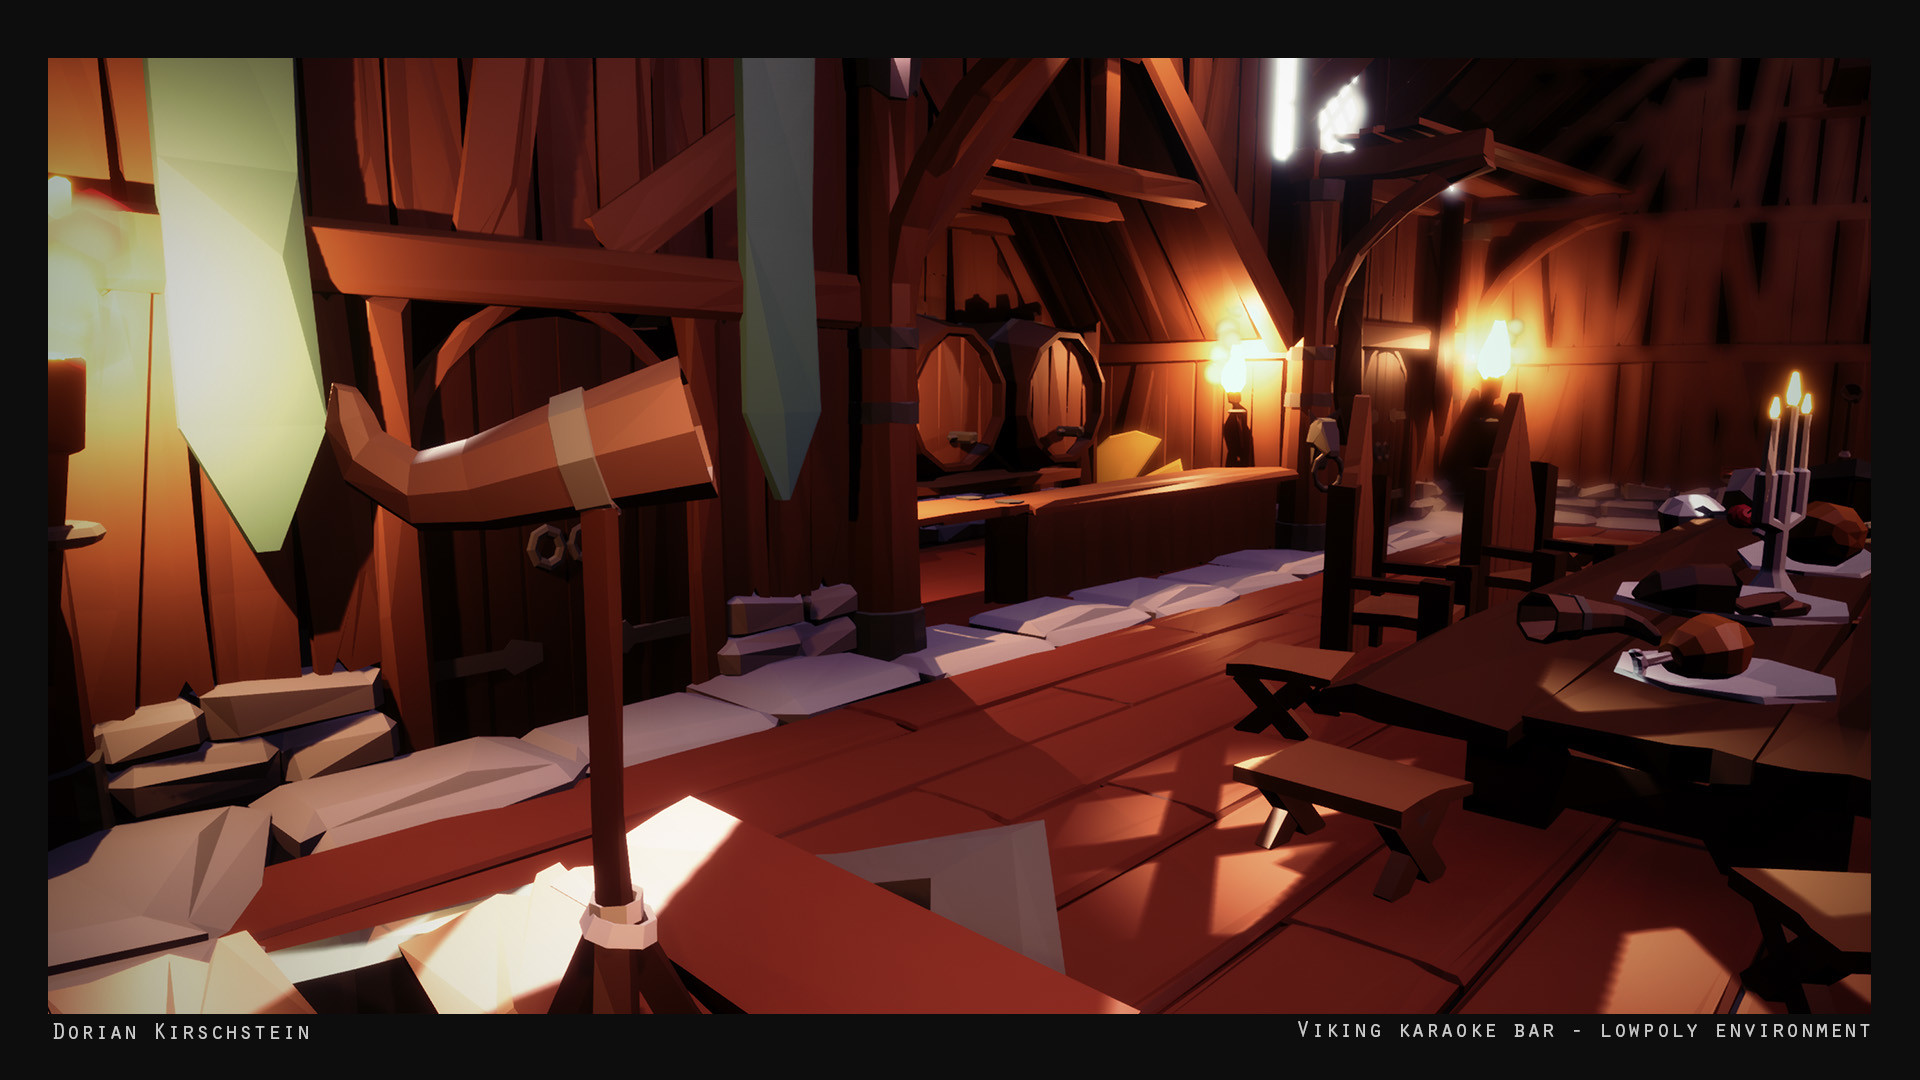 ArtStation - Viking Karaoke Bar Lowpoly Environment, Dorian